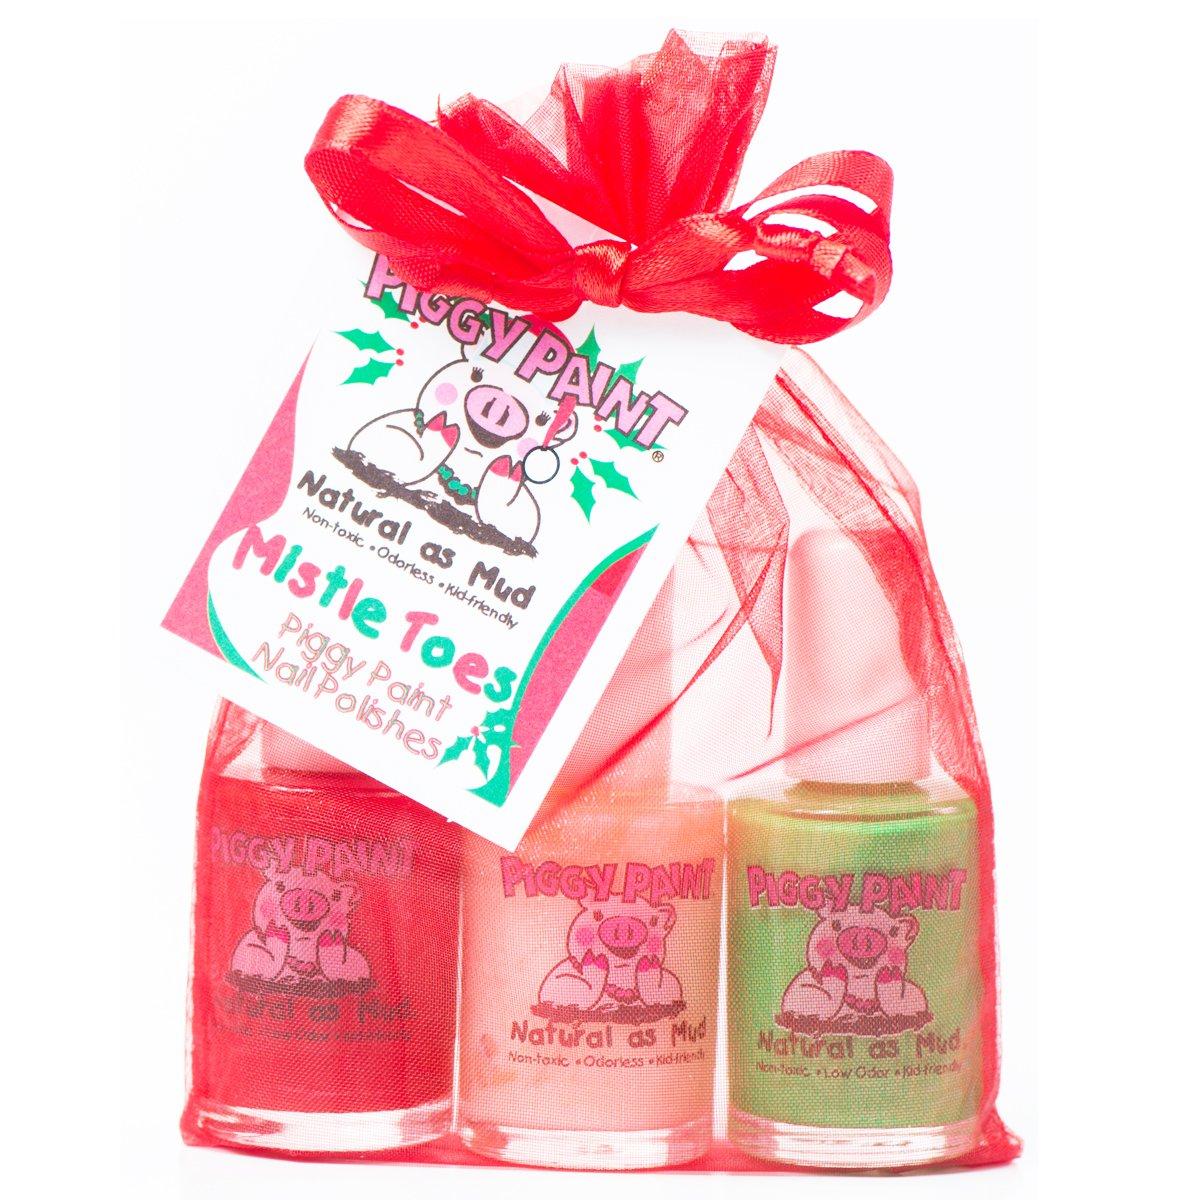 Amazon.com : Piggy Paint Nail Polish Gift Set, Mistletoes : Piggy ...